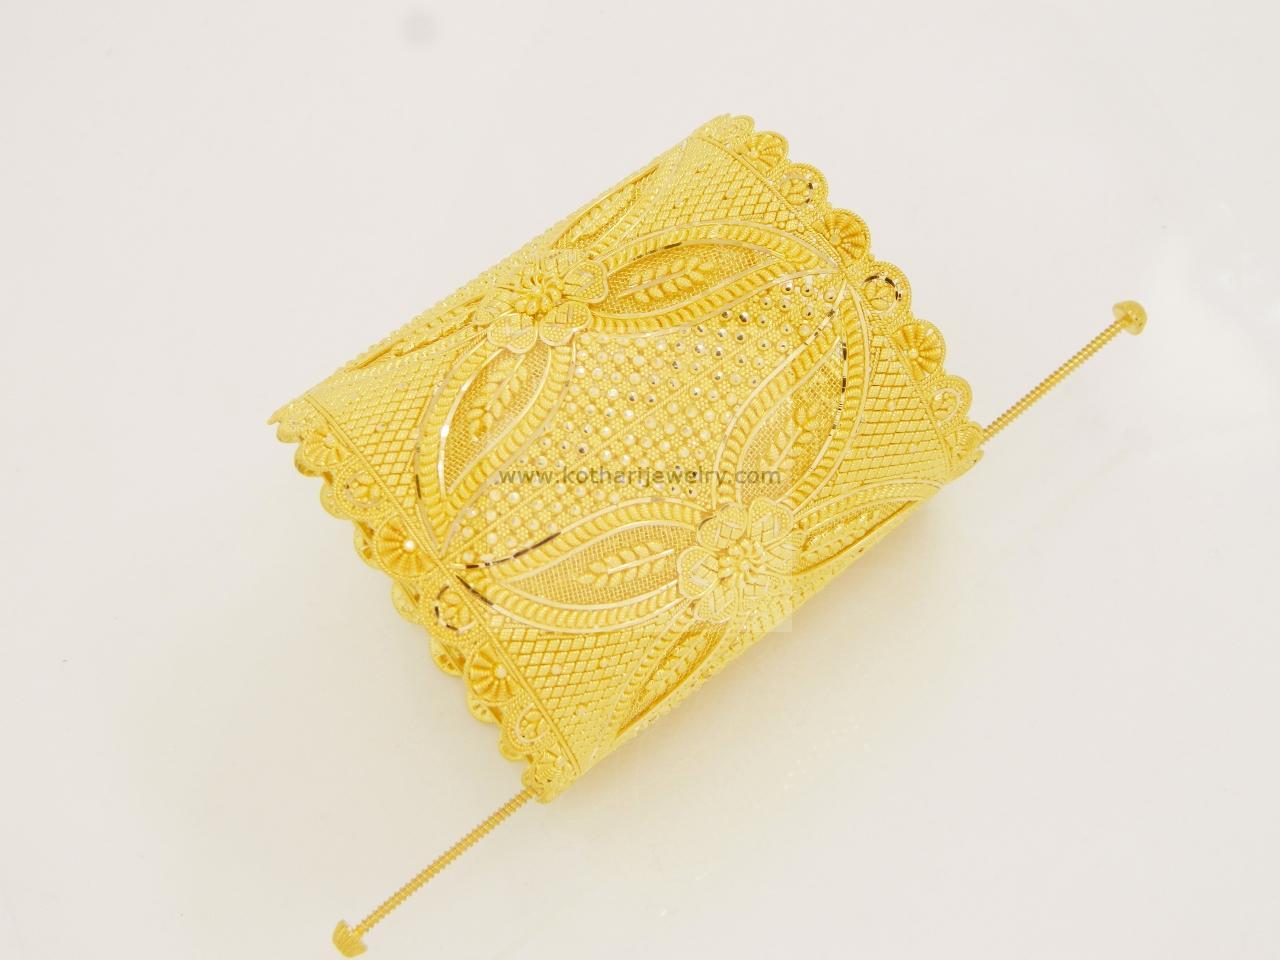 Gold Bangles - 22Kt Gold Bangles, 22Kt Gold Bangles, 22Kt Gold Bangles